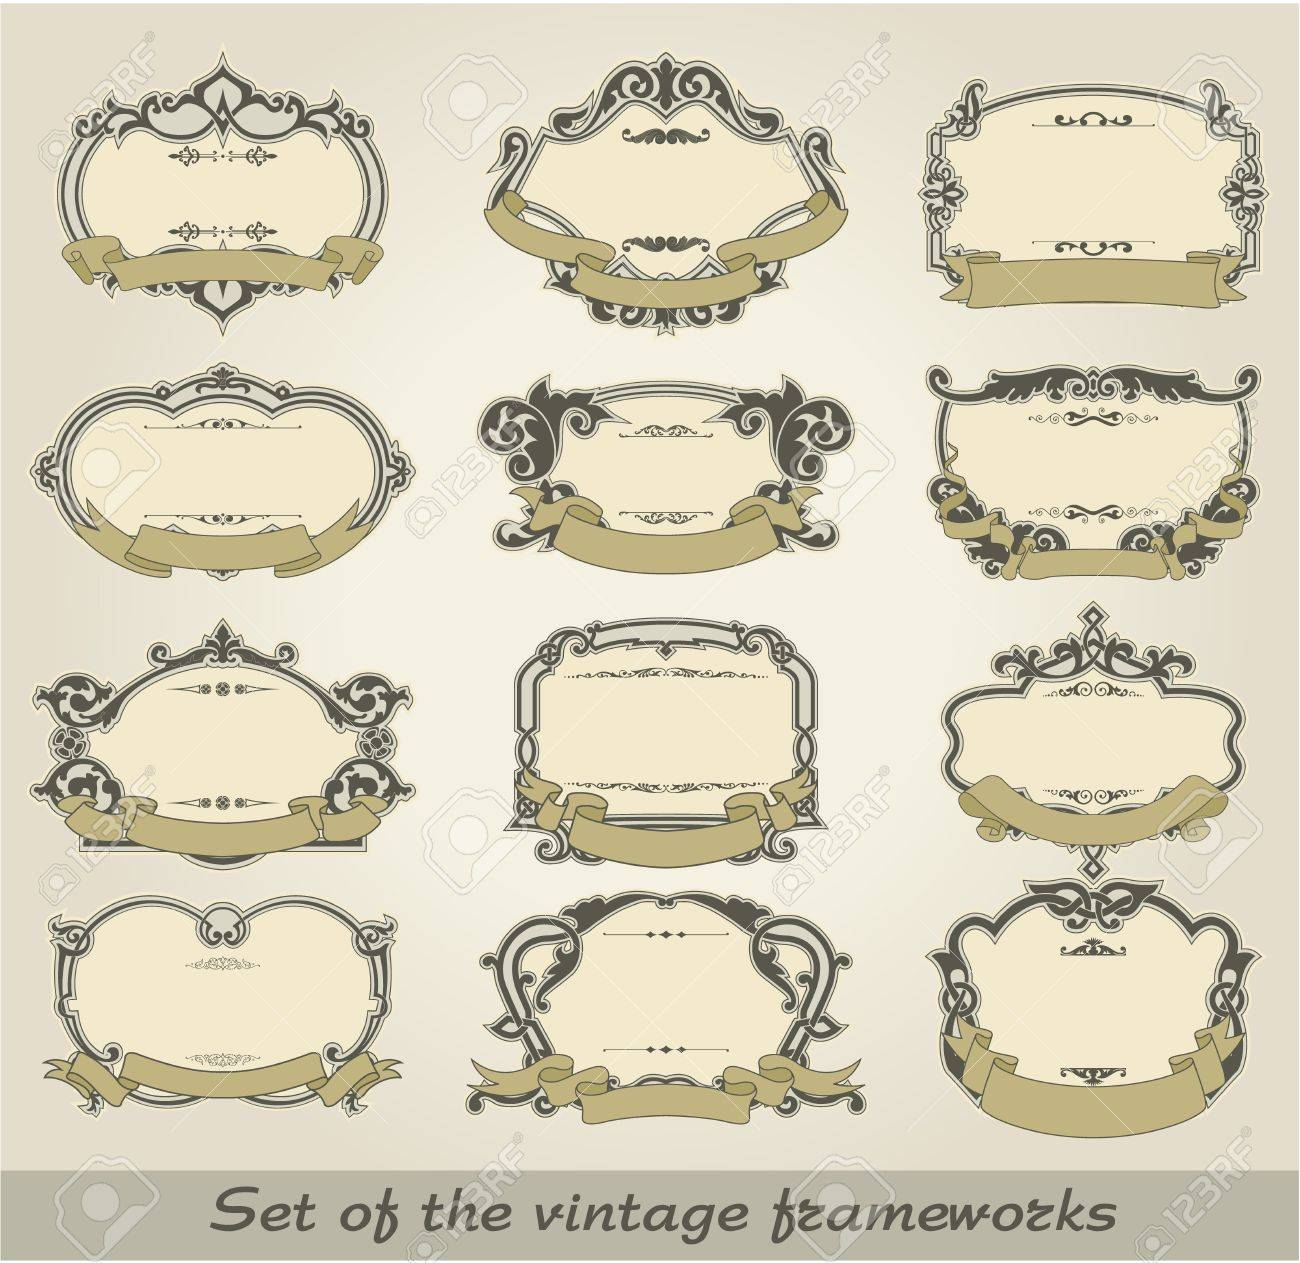 The image of color Set of the vintage frameworks Stock Vector - 15483519